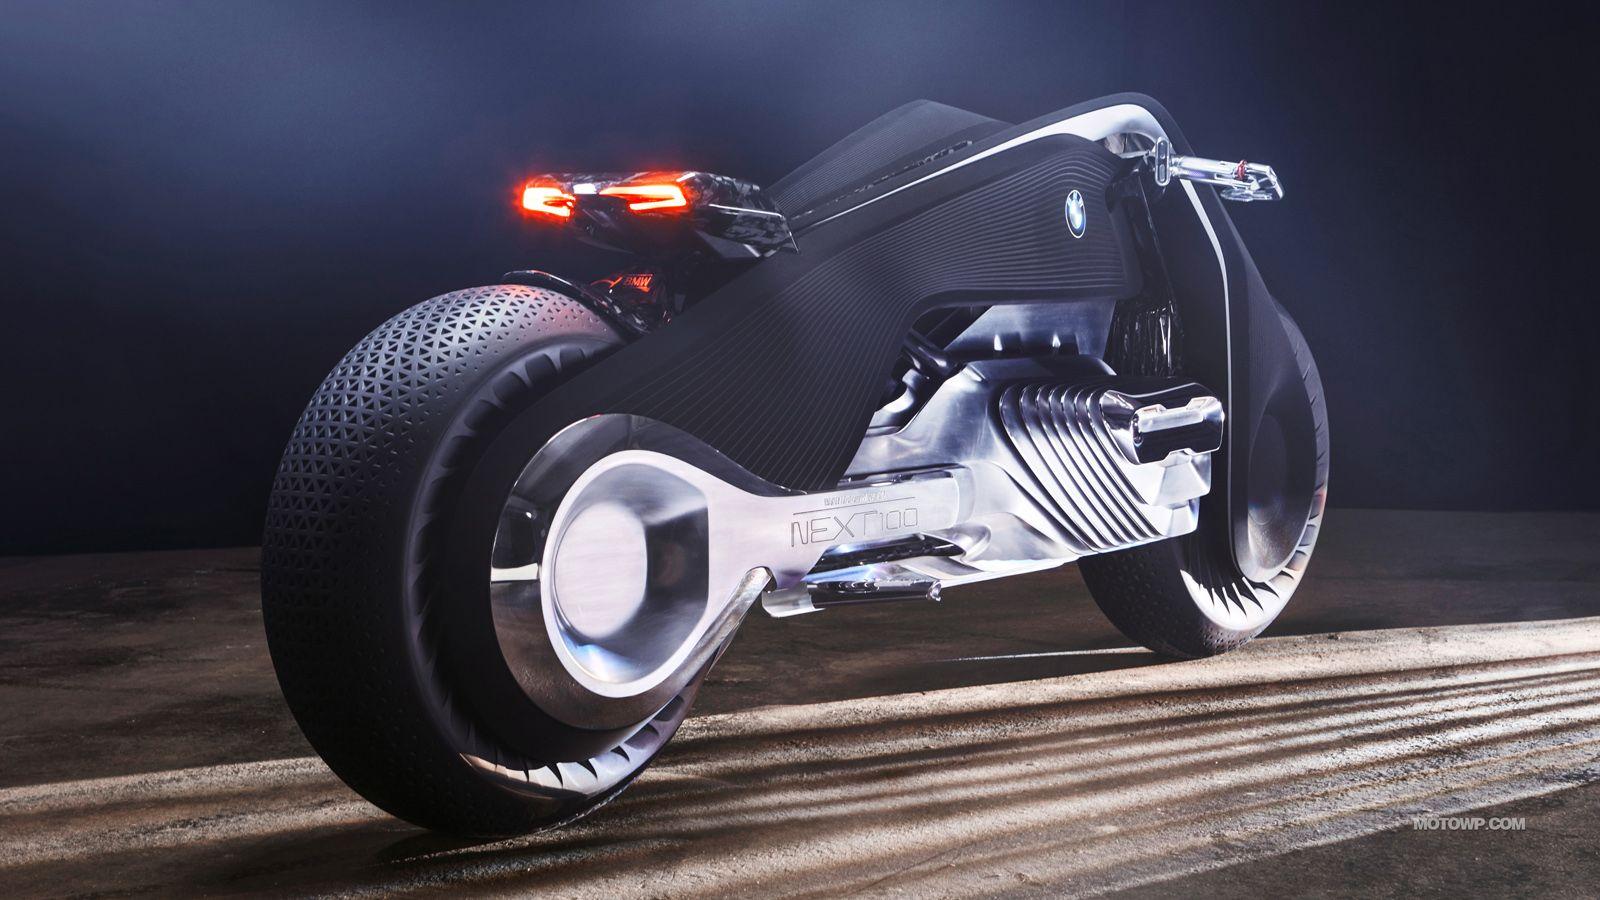 Pin By Jhao Cing Li On Motors Concept Motorcycles Bmw Motorrad